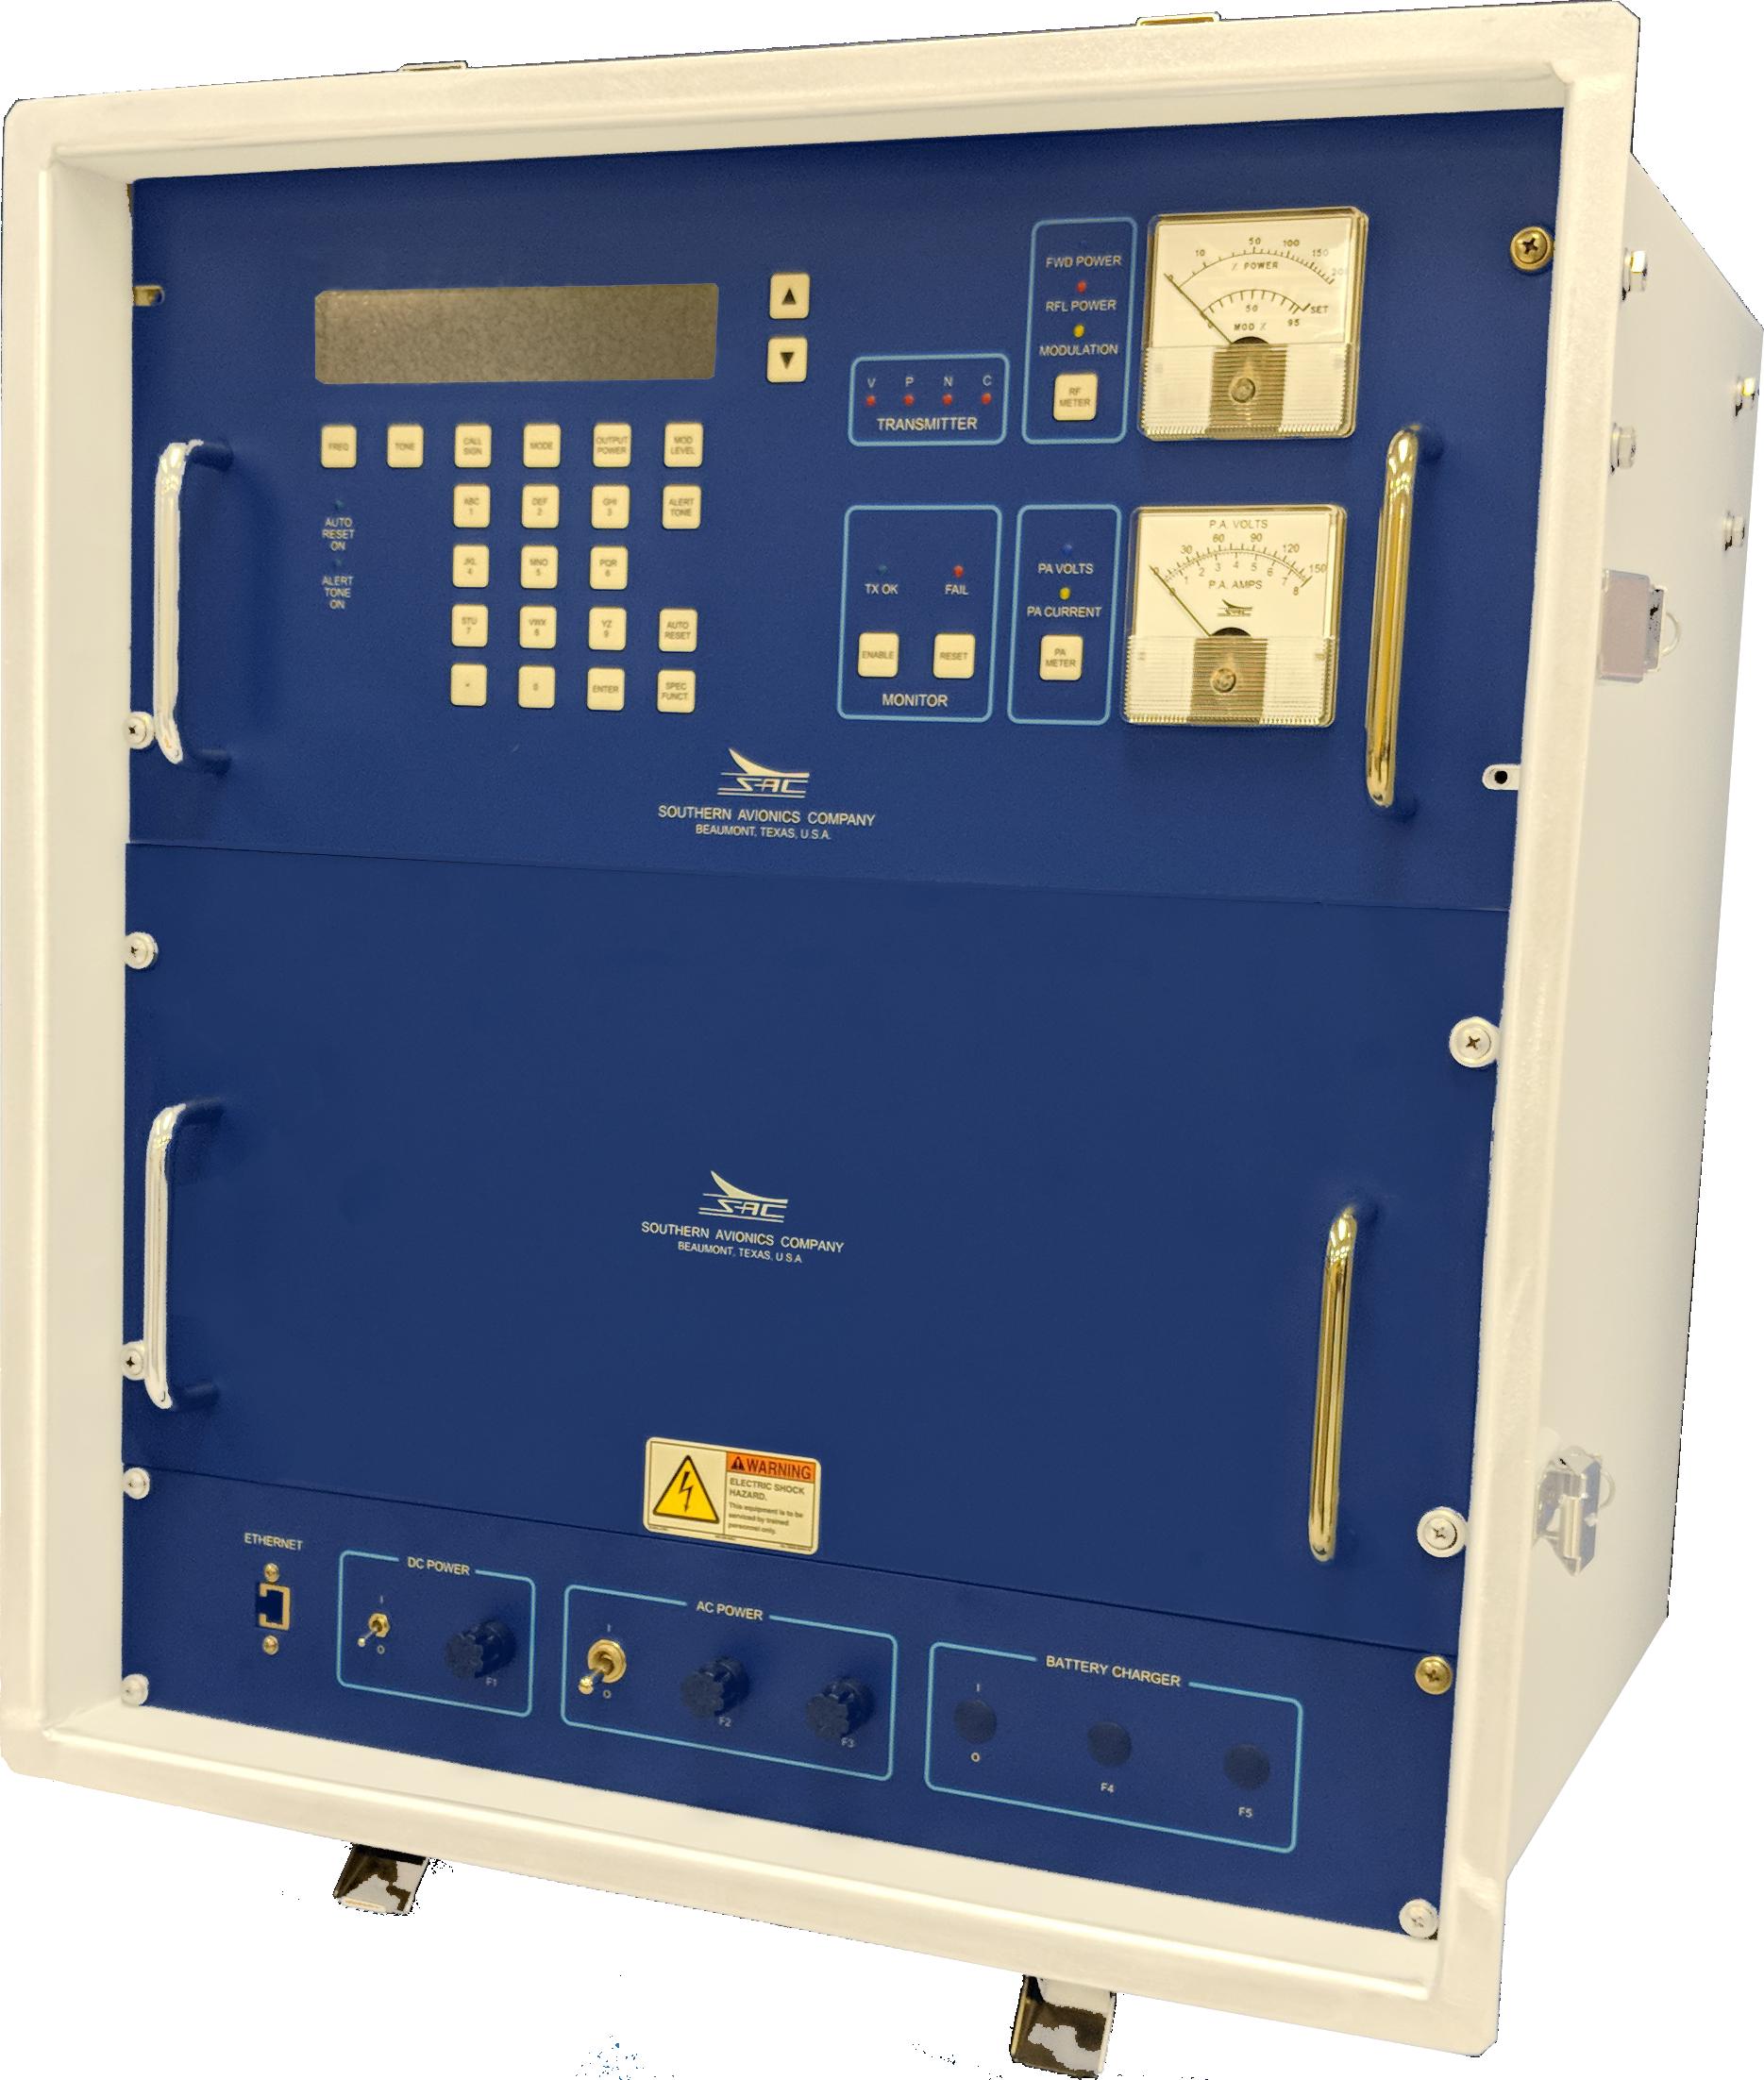 SE125 Single IP66 TransparentBG